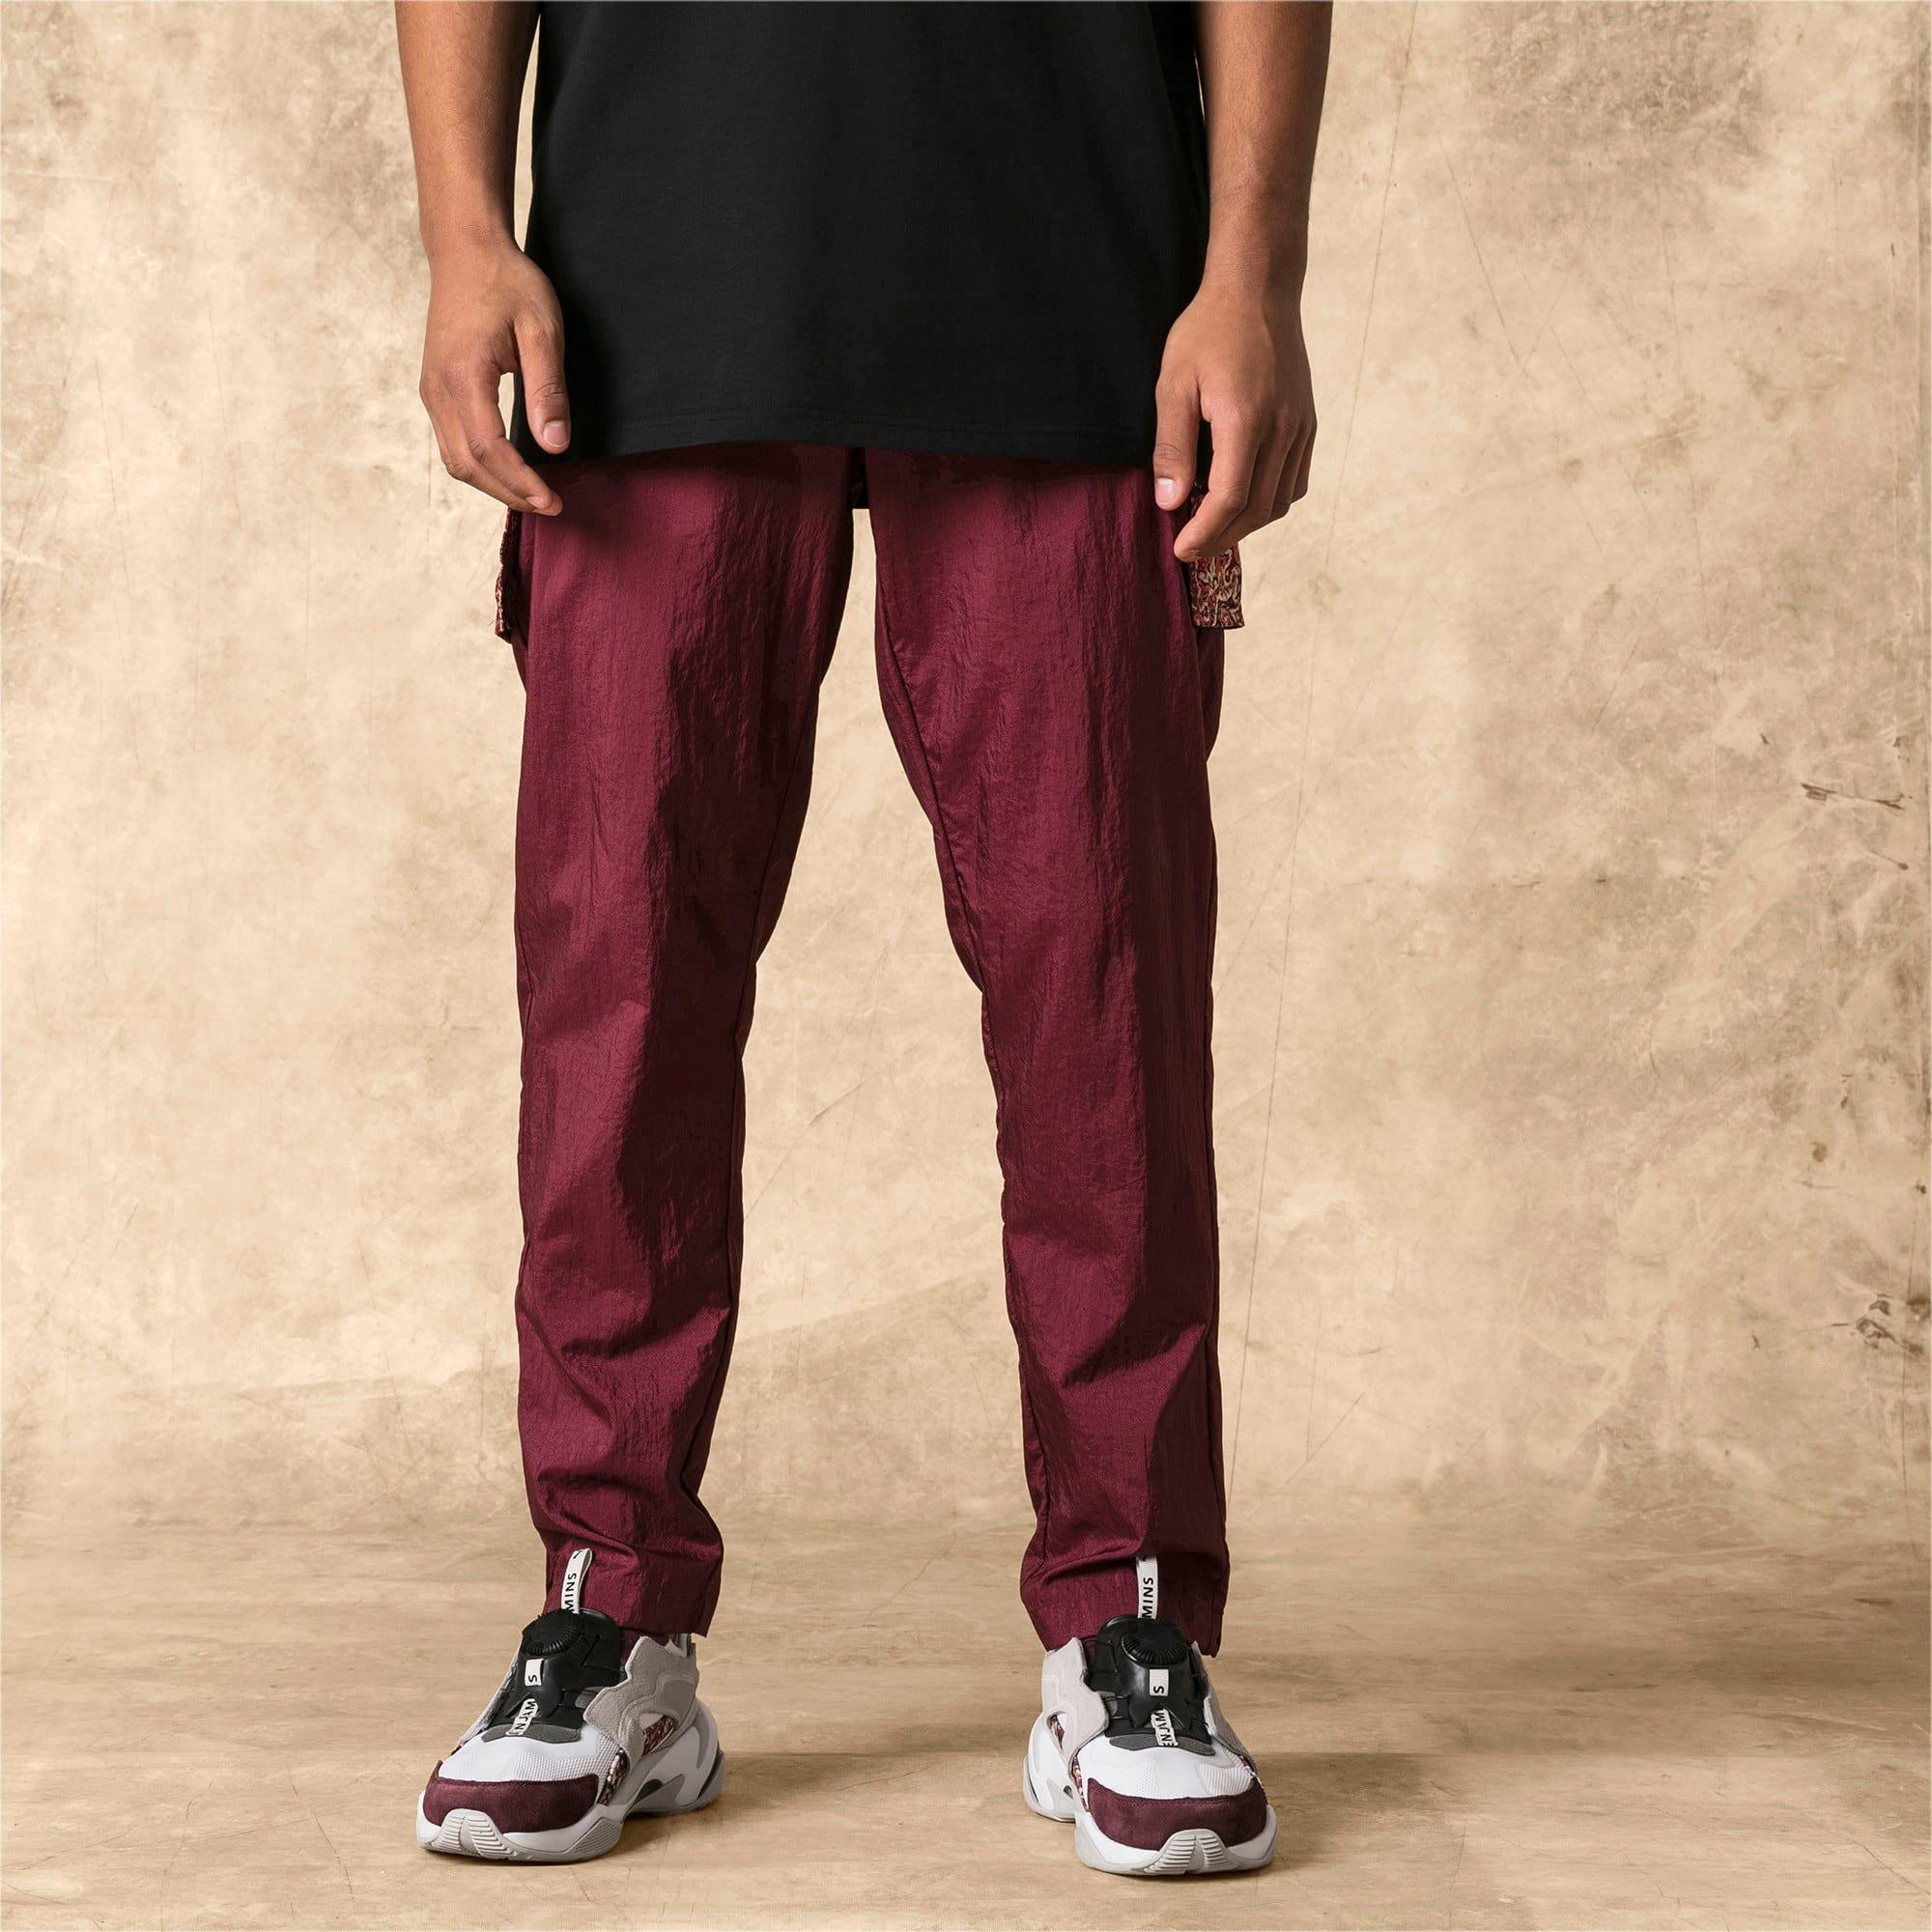 Miniatura 1 de Pantalones deportivos PUMA x LES BENJAMINS para hombre, Burgundy, mediano